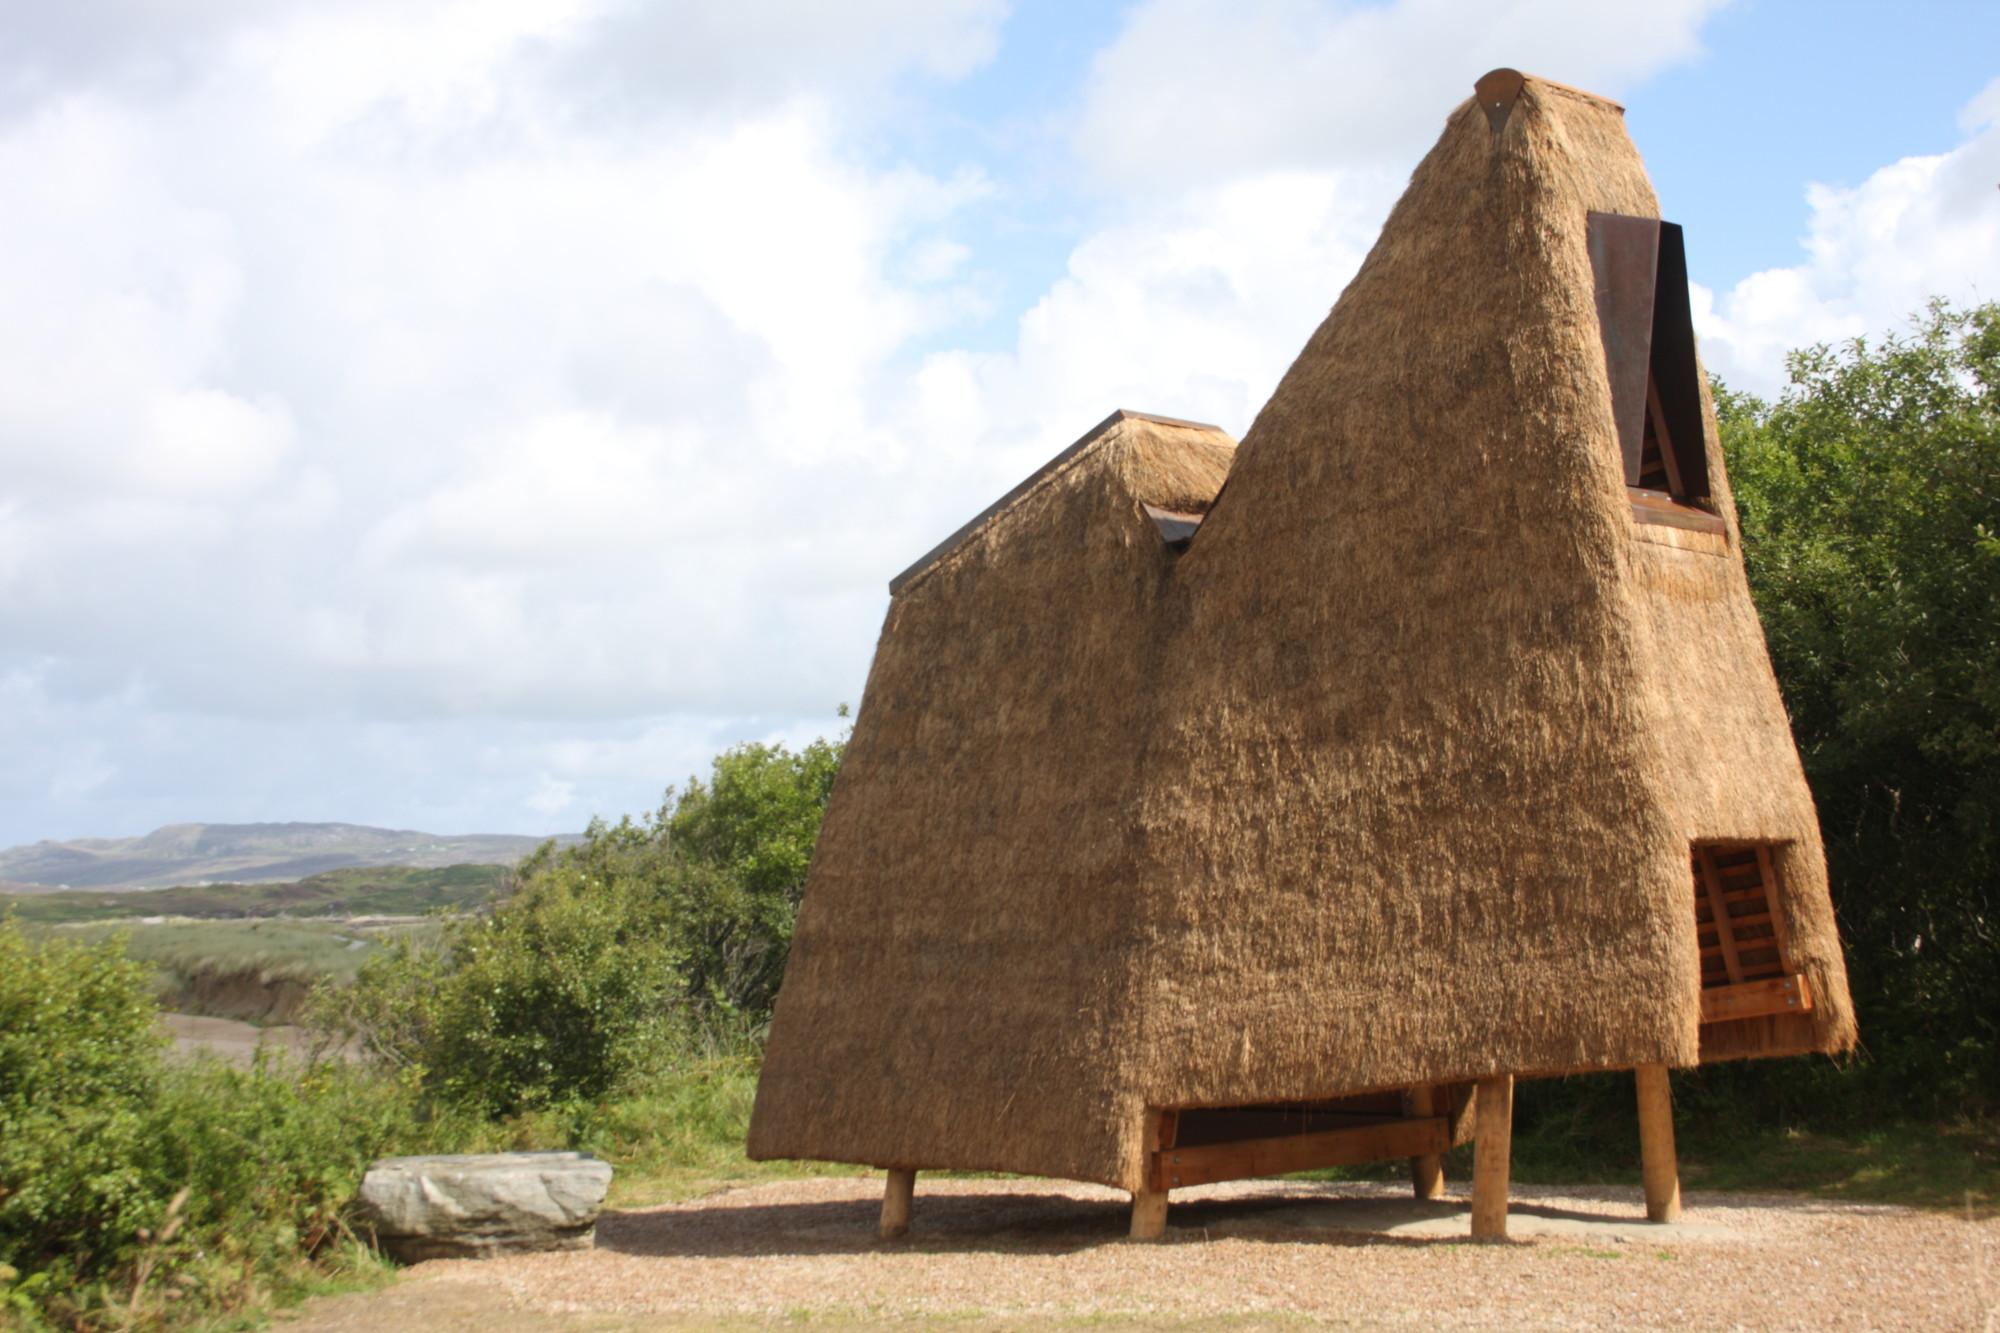 Jeffry's House / Emily Mannion + Thomas O'Brien, Courtesy of Emily Mannion + Thomas O Brien